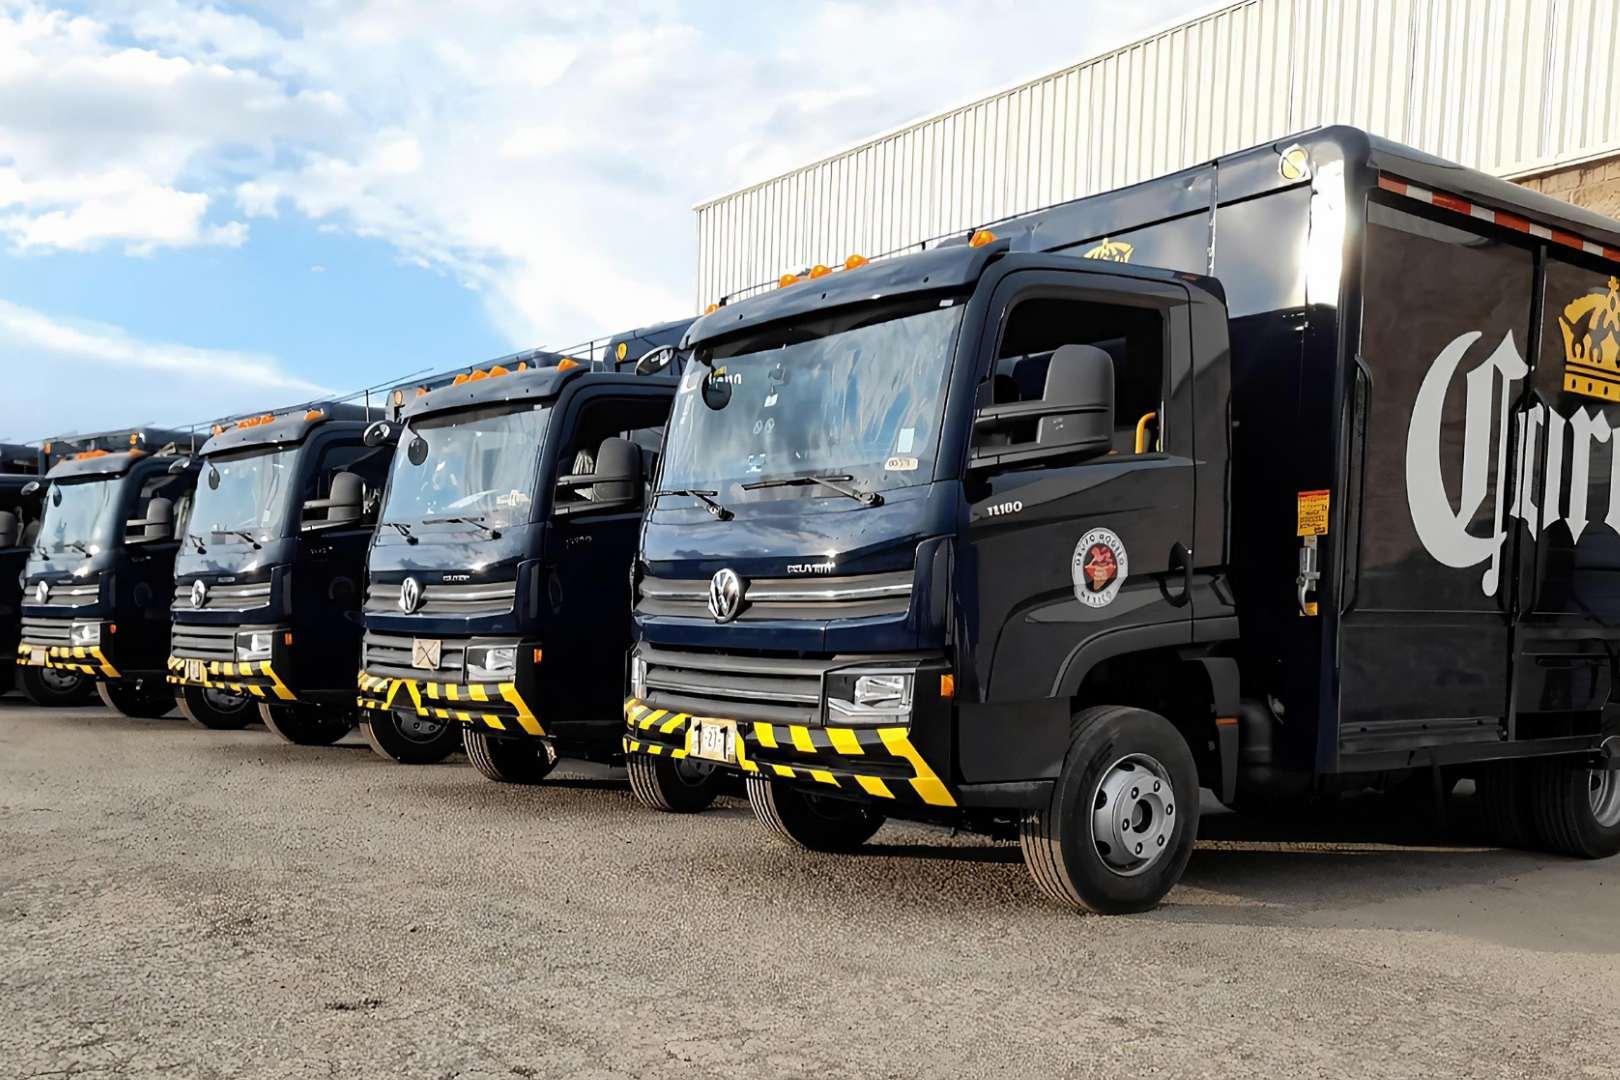 Volkswagen Camiones y Buses Grupo Modelo